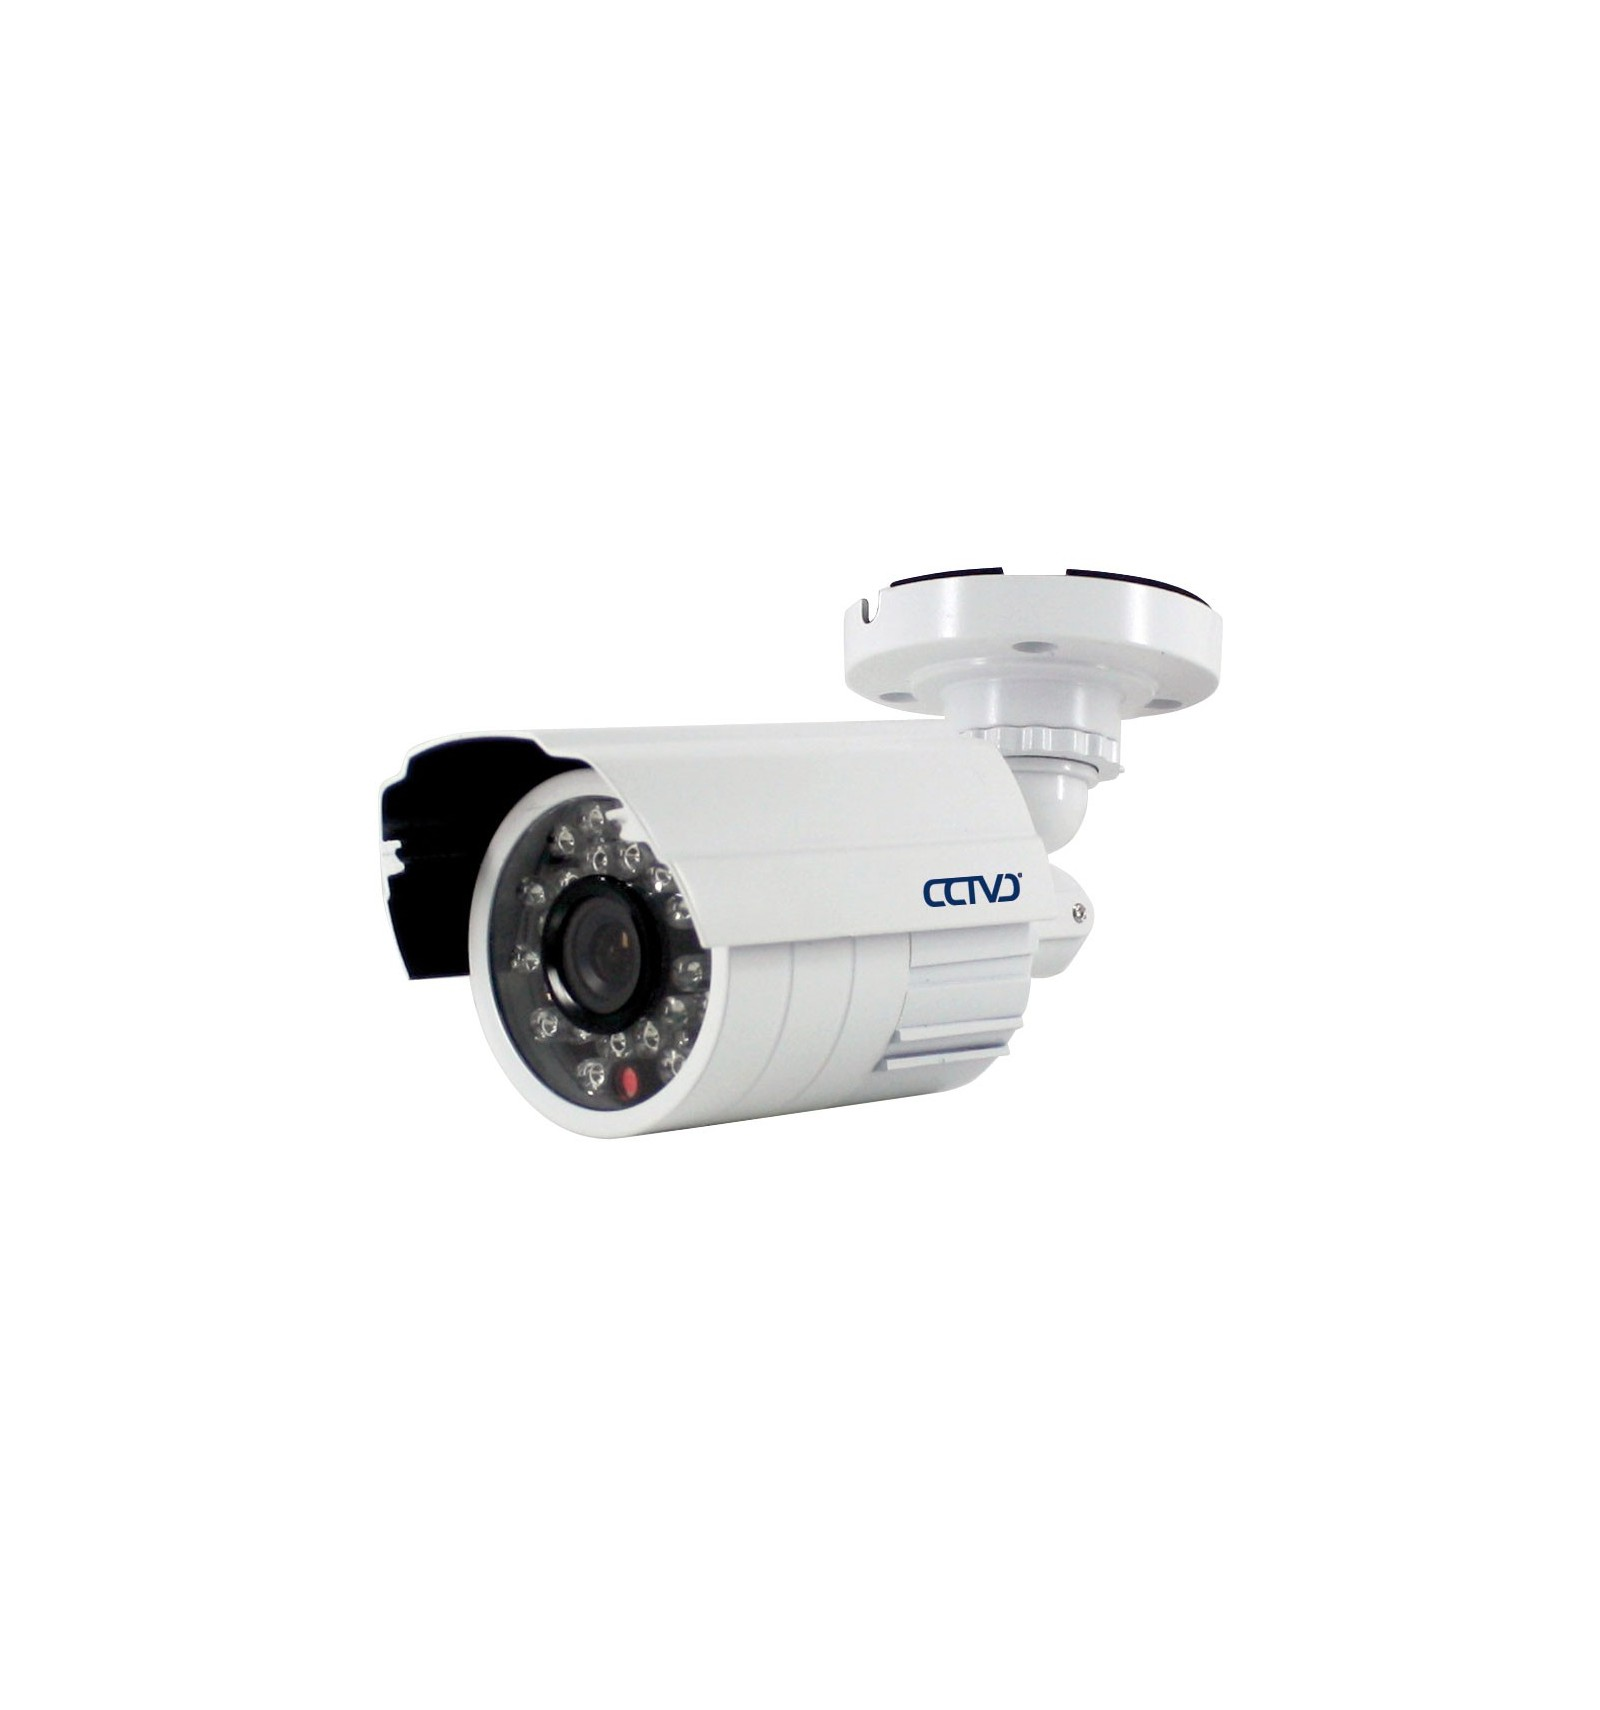 Camaras de vigilancia exterior gama economica - Camaras vigilancia exterior ...